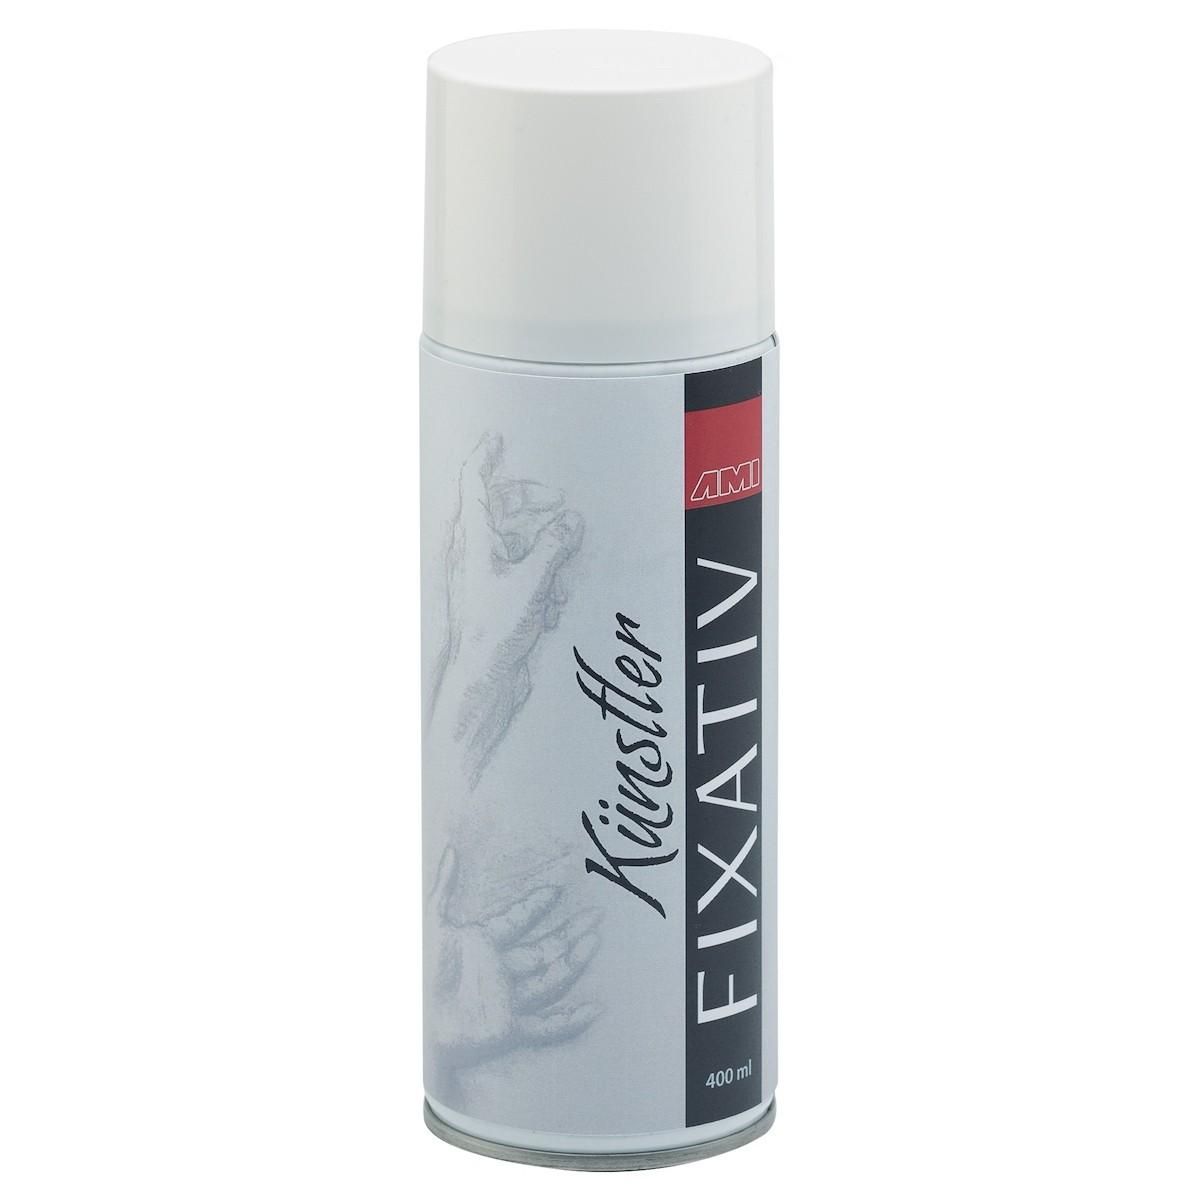 Fixativ spray, AMI, 400ml